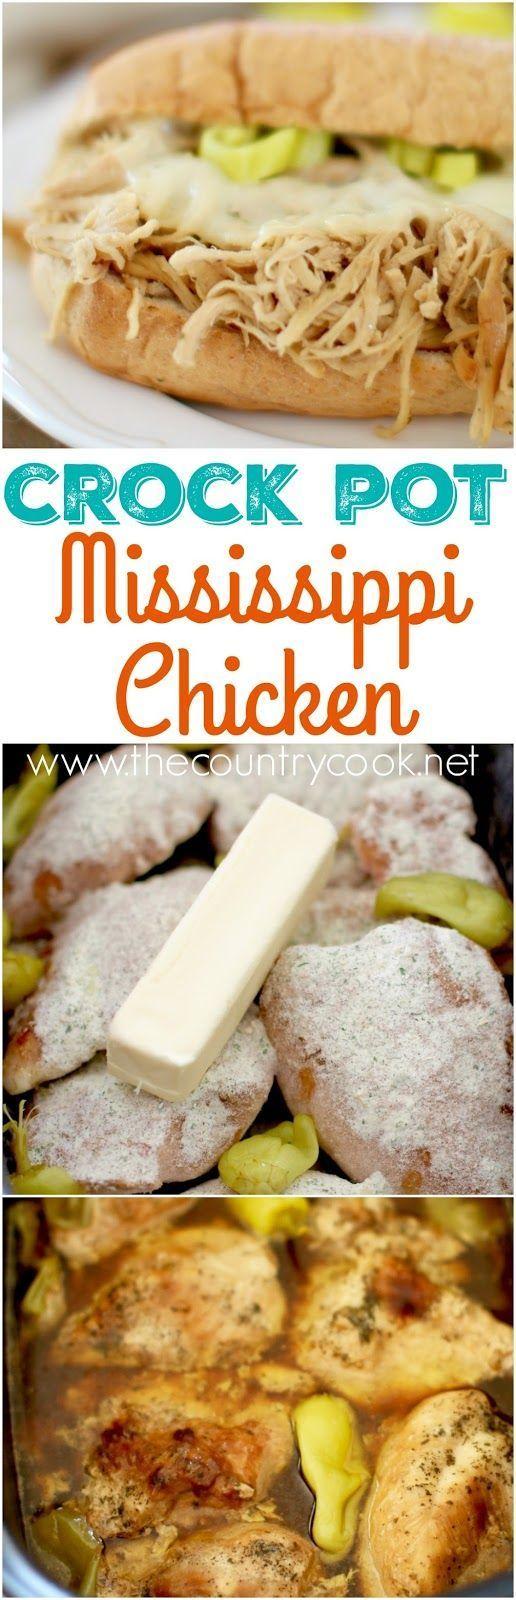 Crock Pot Mississippi Chicken